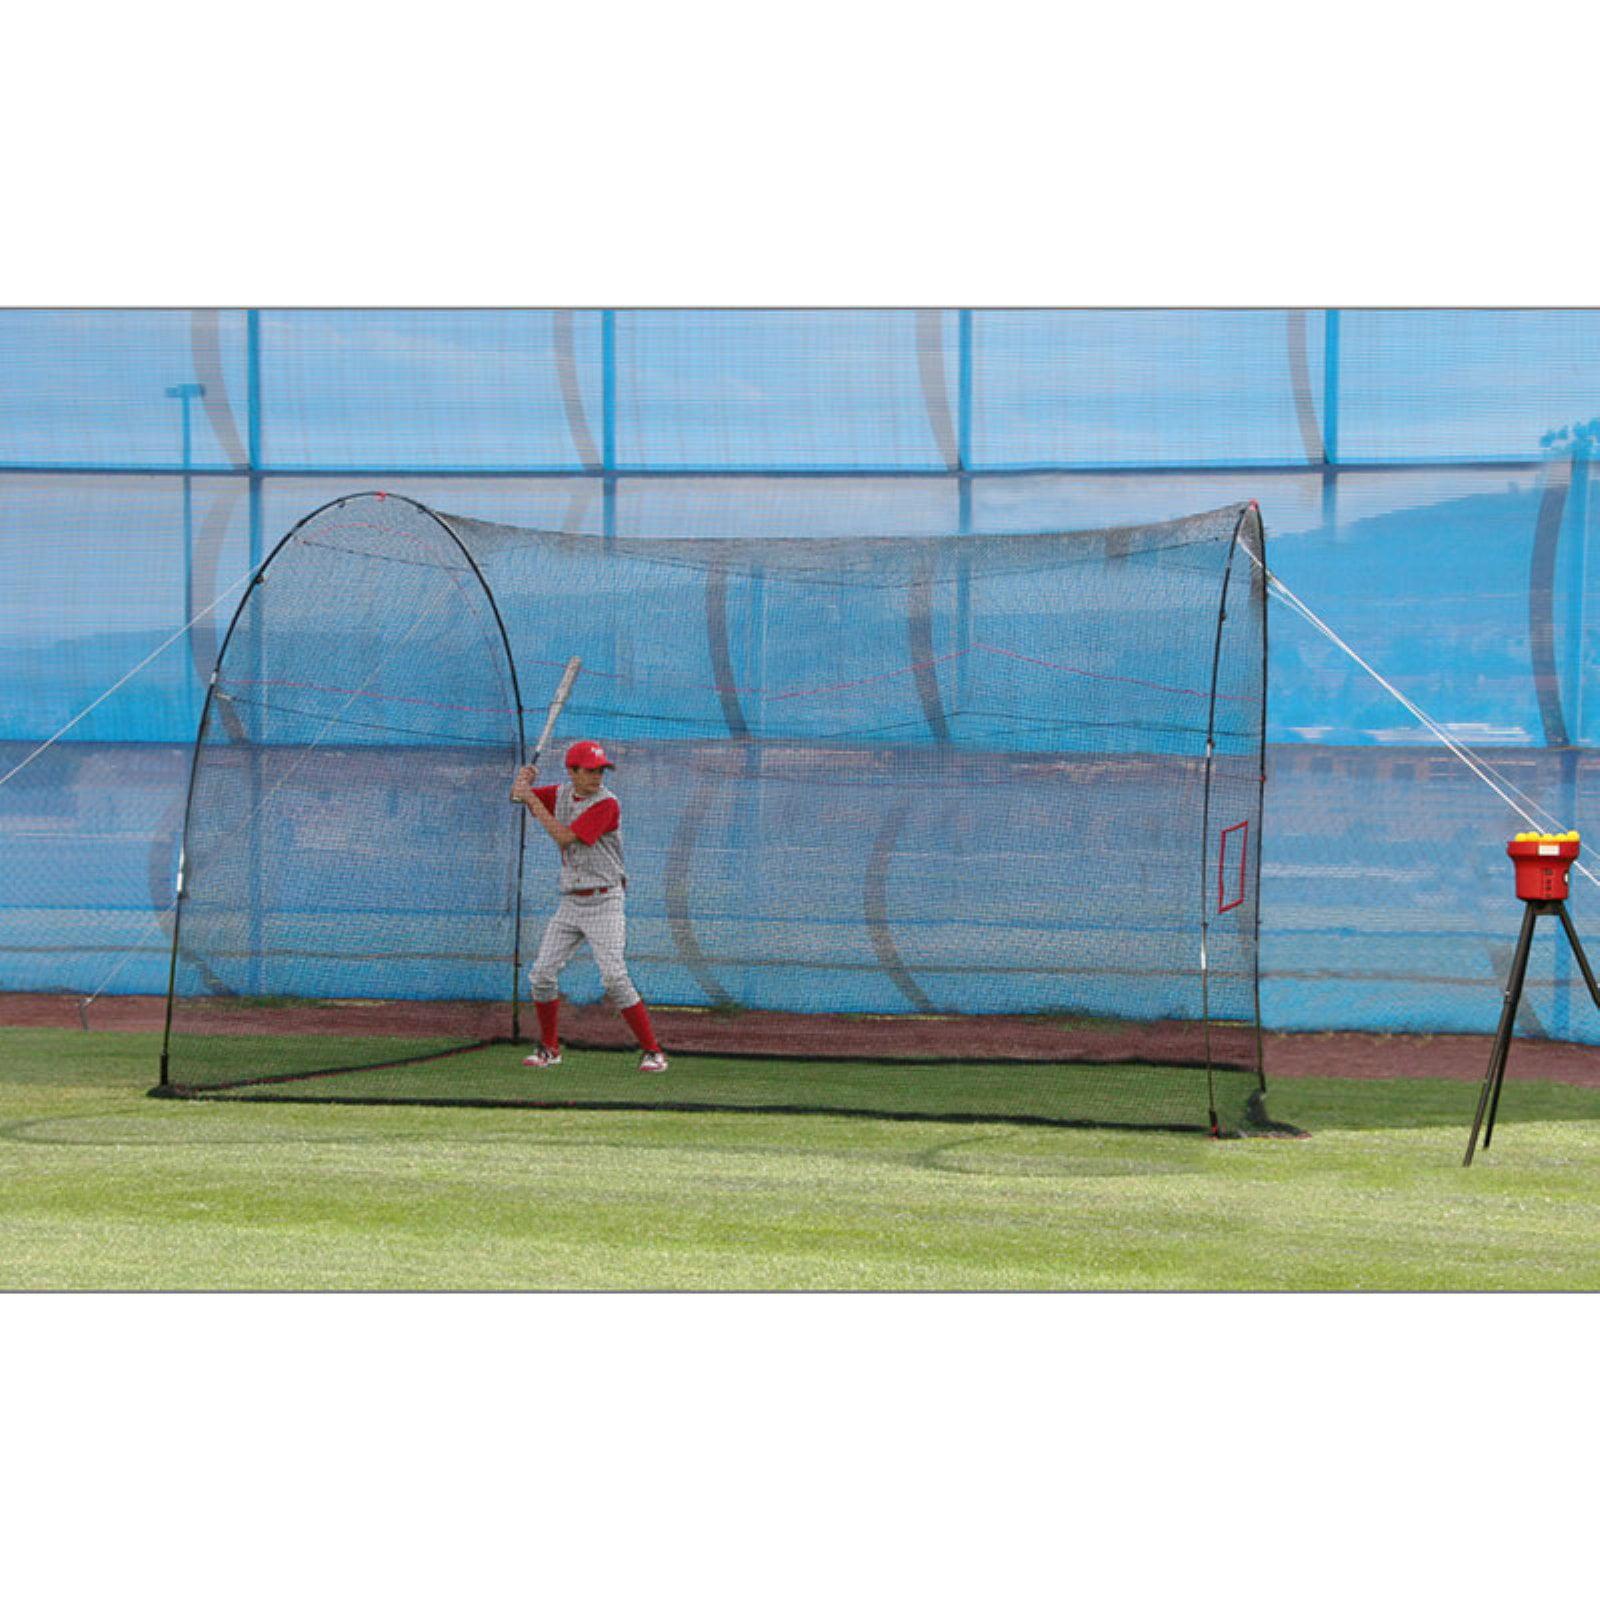 Trend Sports Heater Sports 12 ft. HomeRun Lite-Ball Batti...